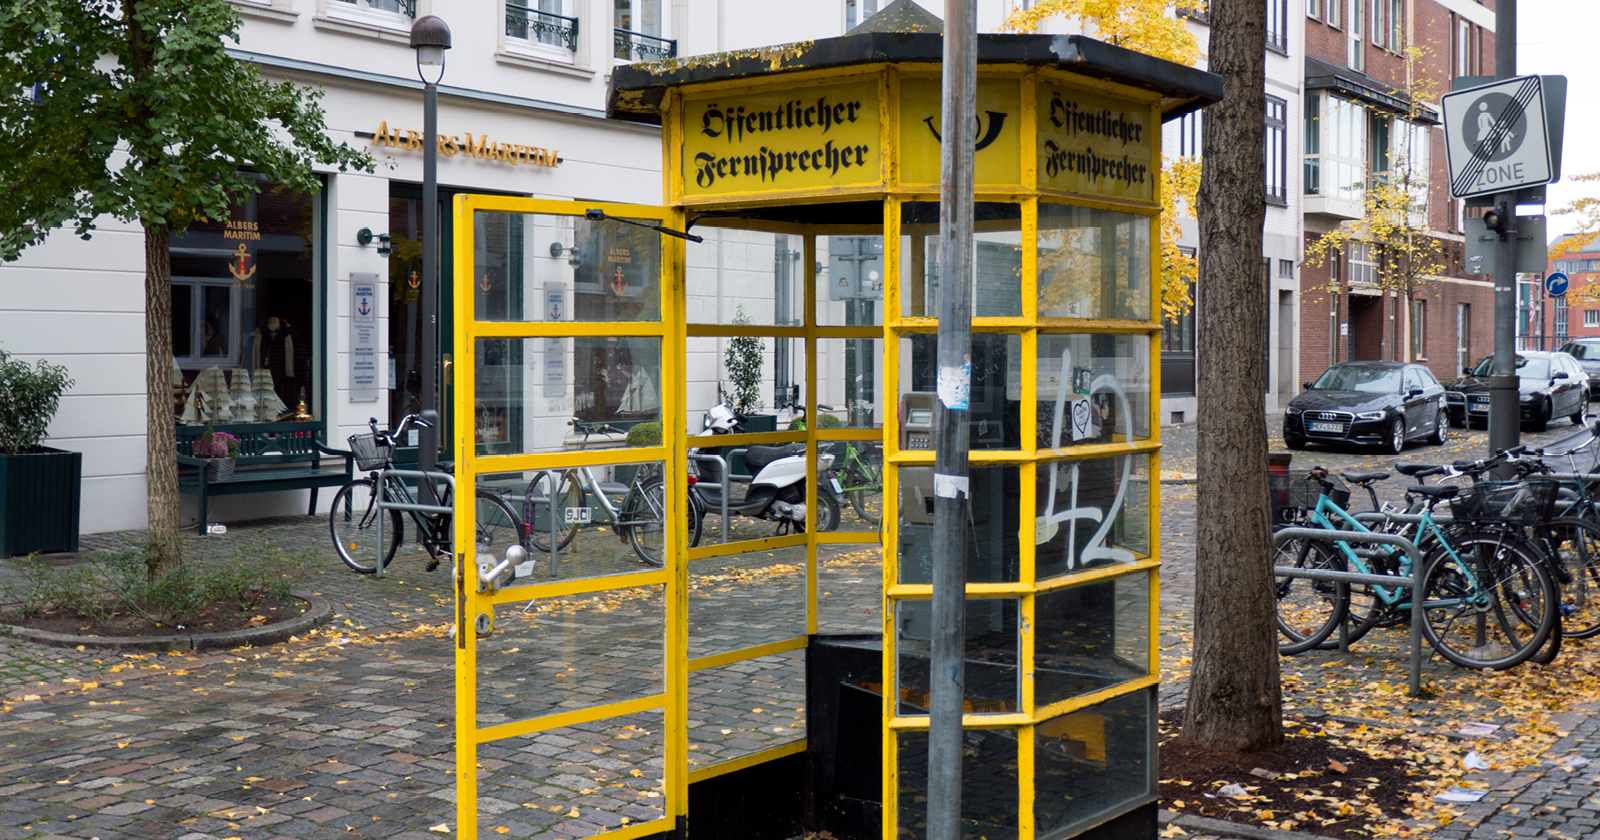 frissewind-foto-reportage8-telefooncel